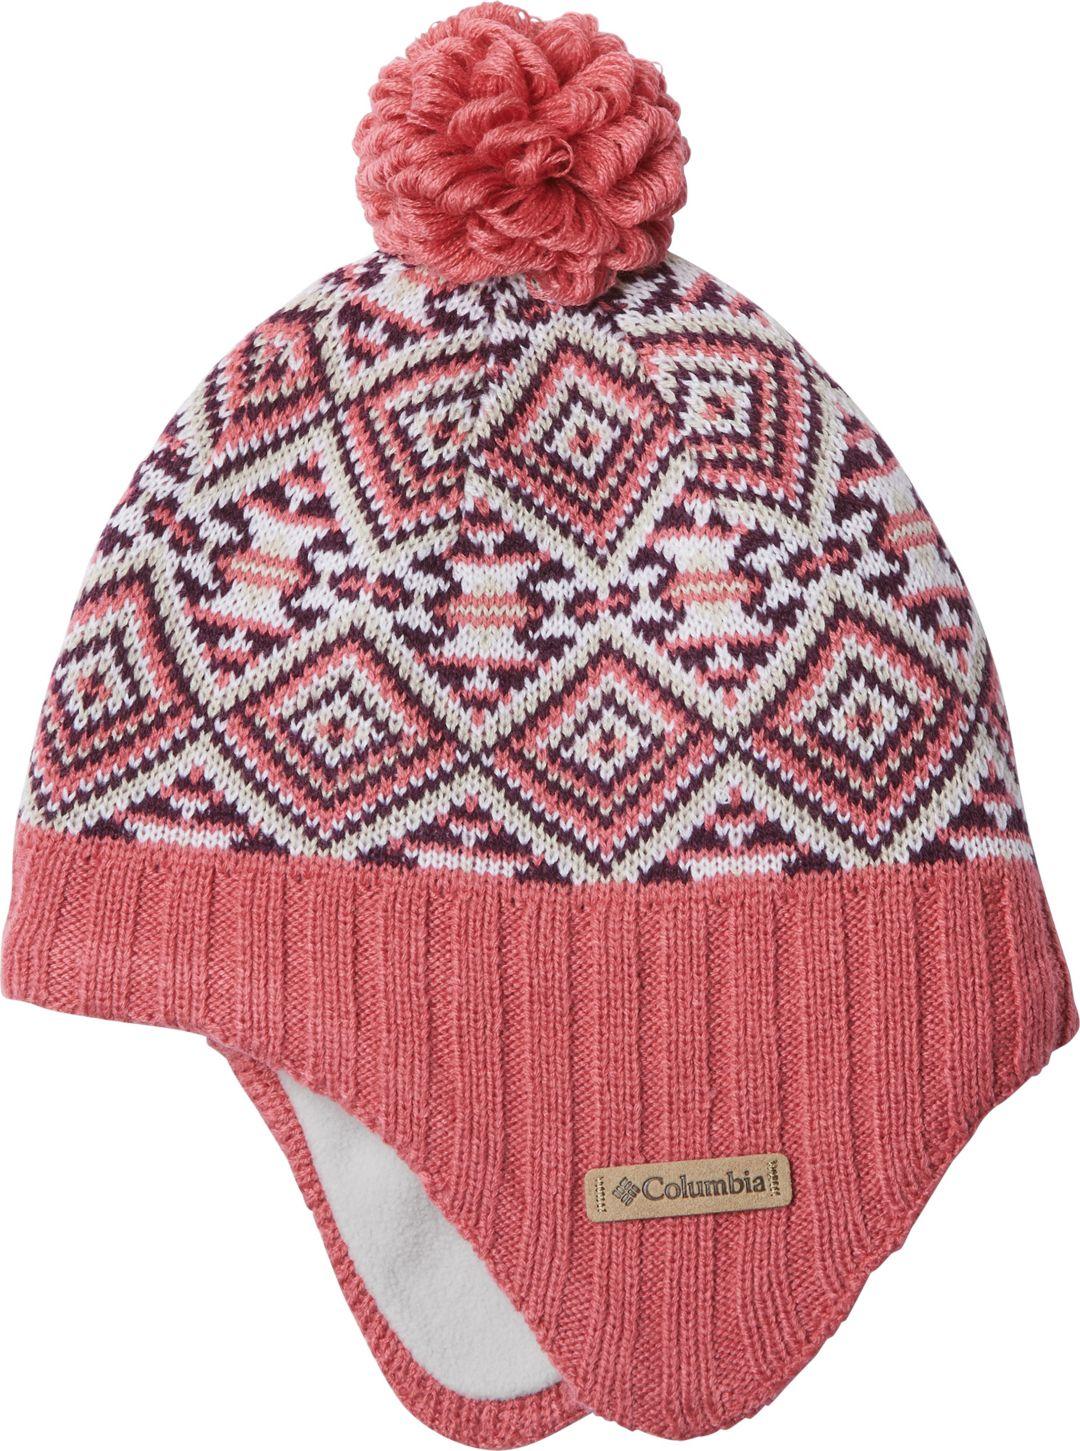 1d0063915 Columbia Youth Winter Worn II Peruvian Hat